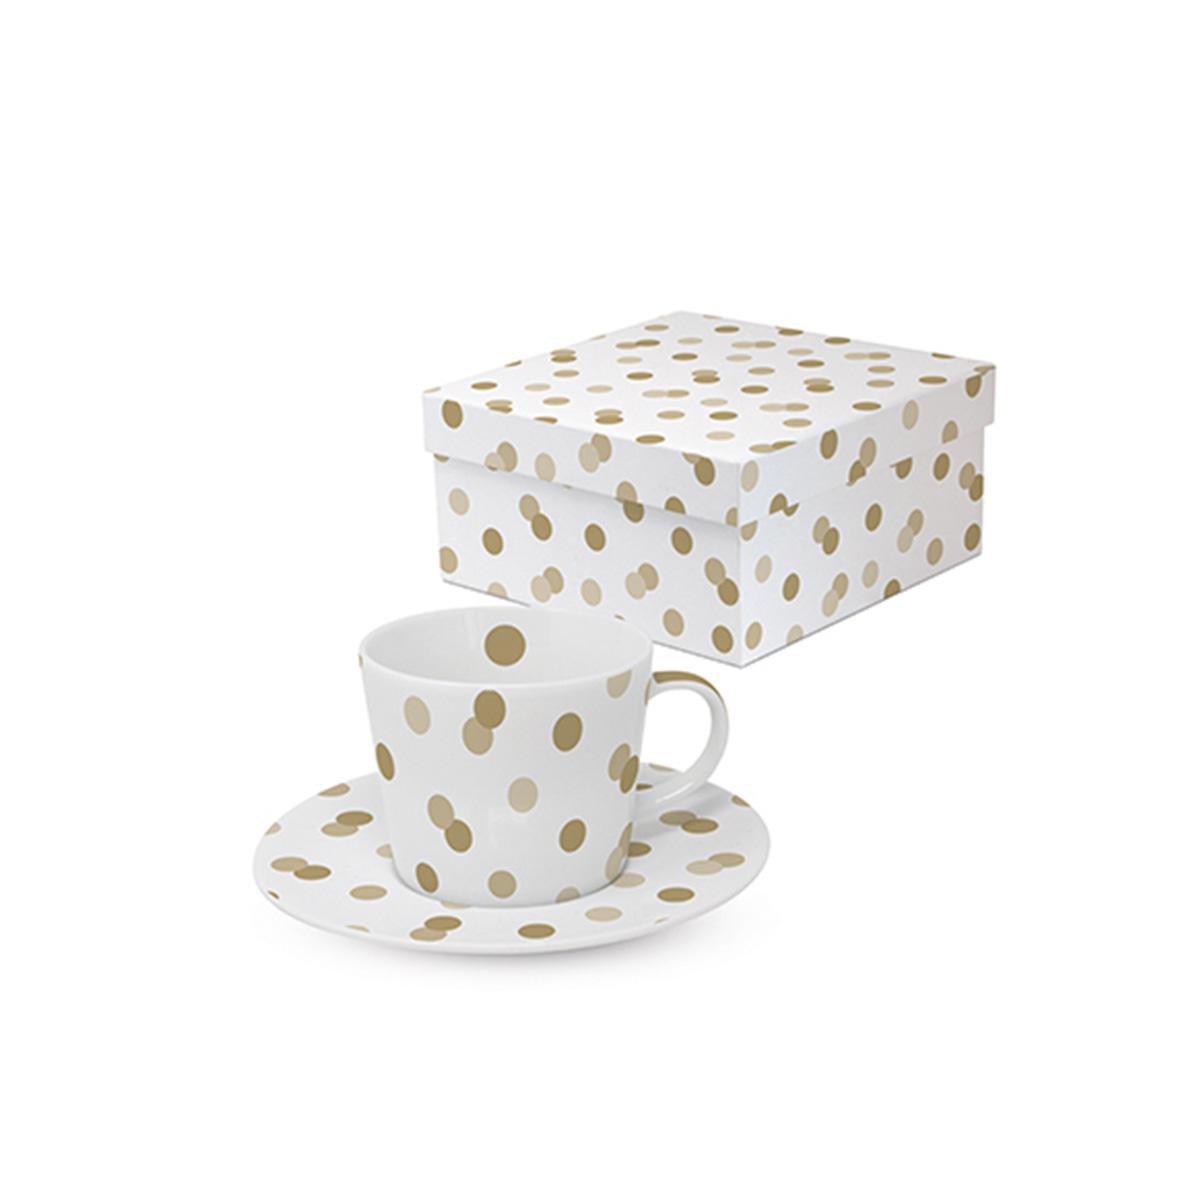 Šoljica za kafu zlatne tufne 603780